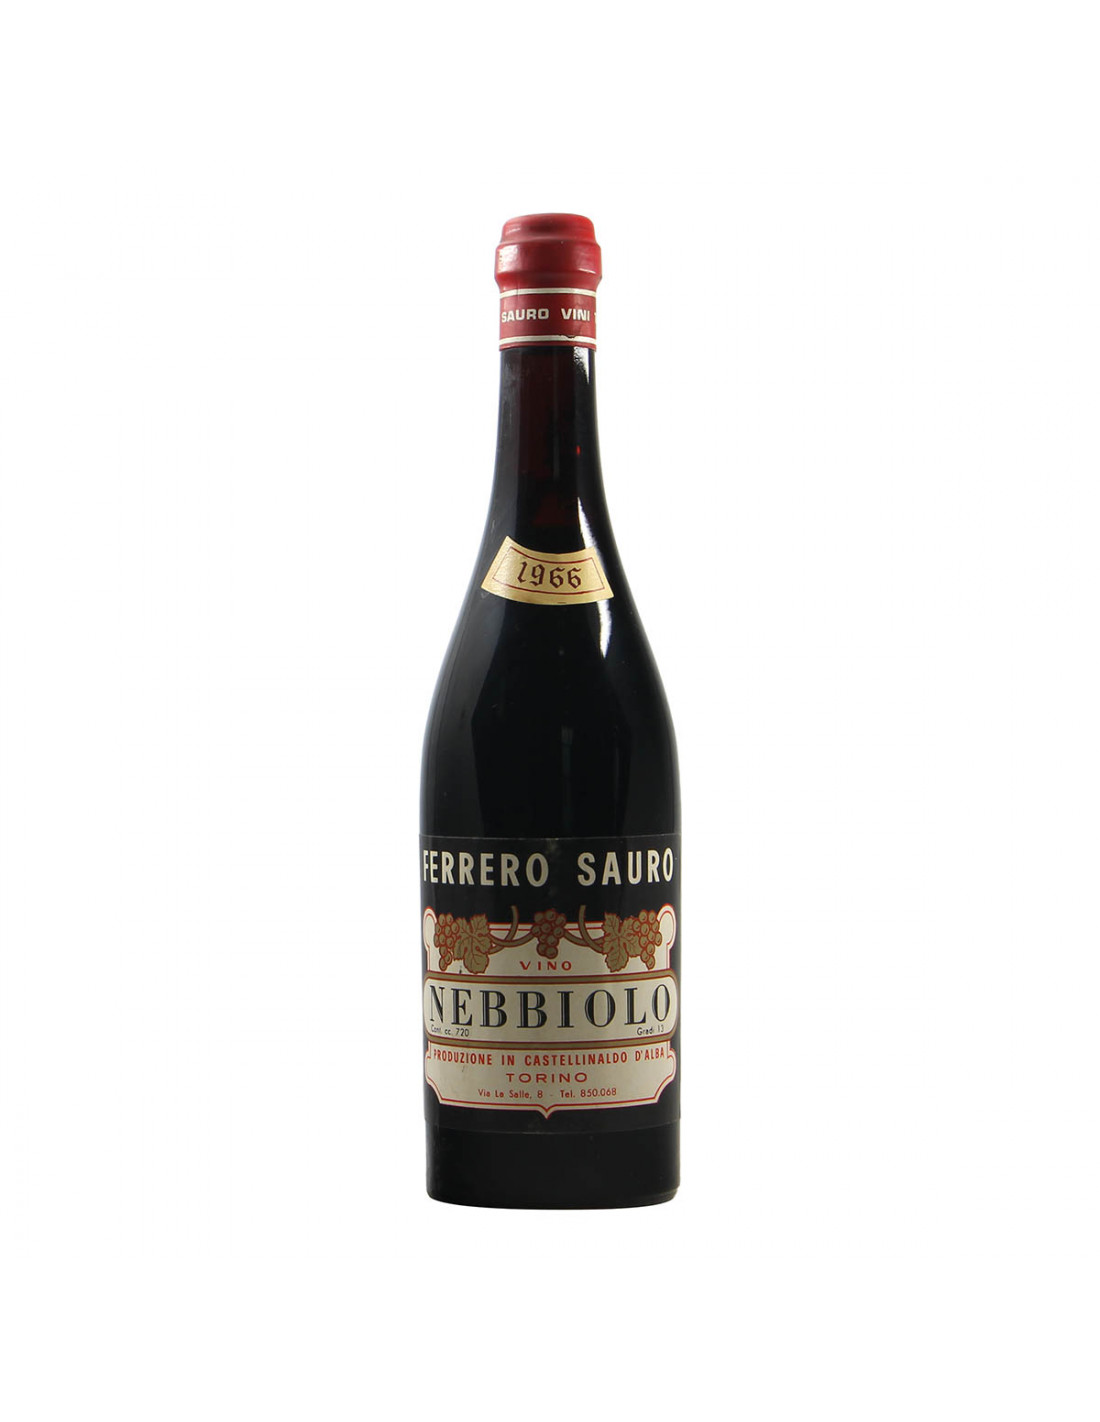 Ferrero Sauro Nebbiolo 1966 Grandi Bottiglie